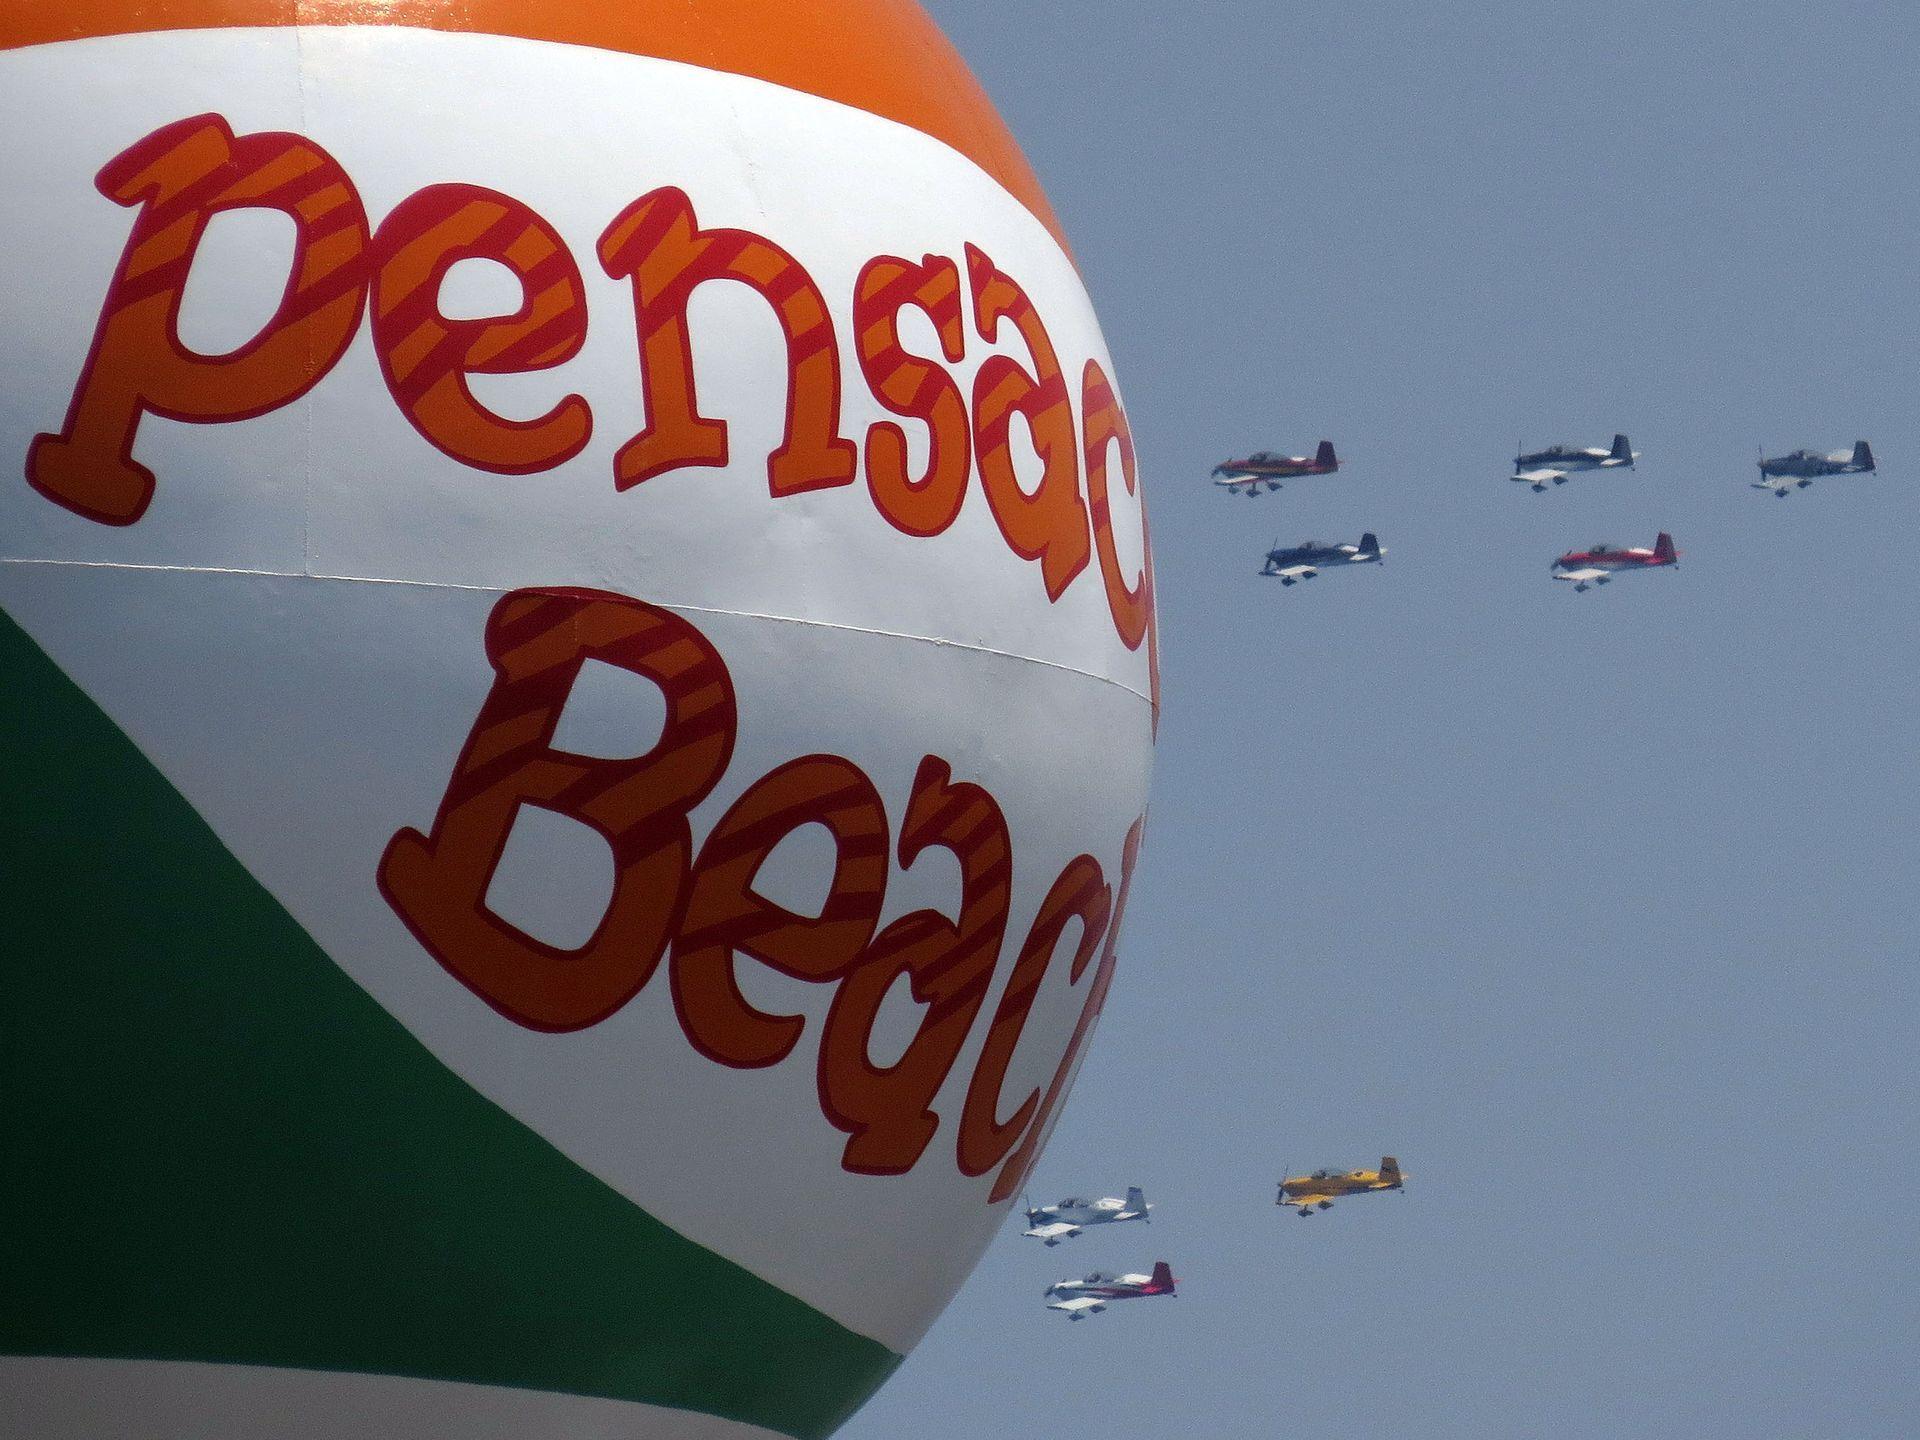 Civilian aircraft pass by the Pensacola Beach ball water